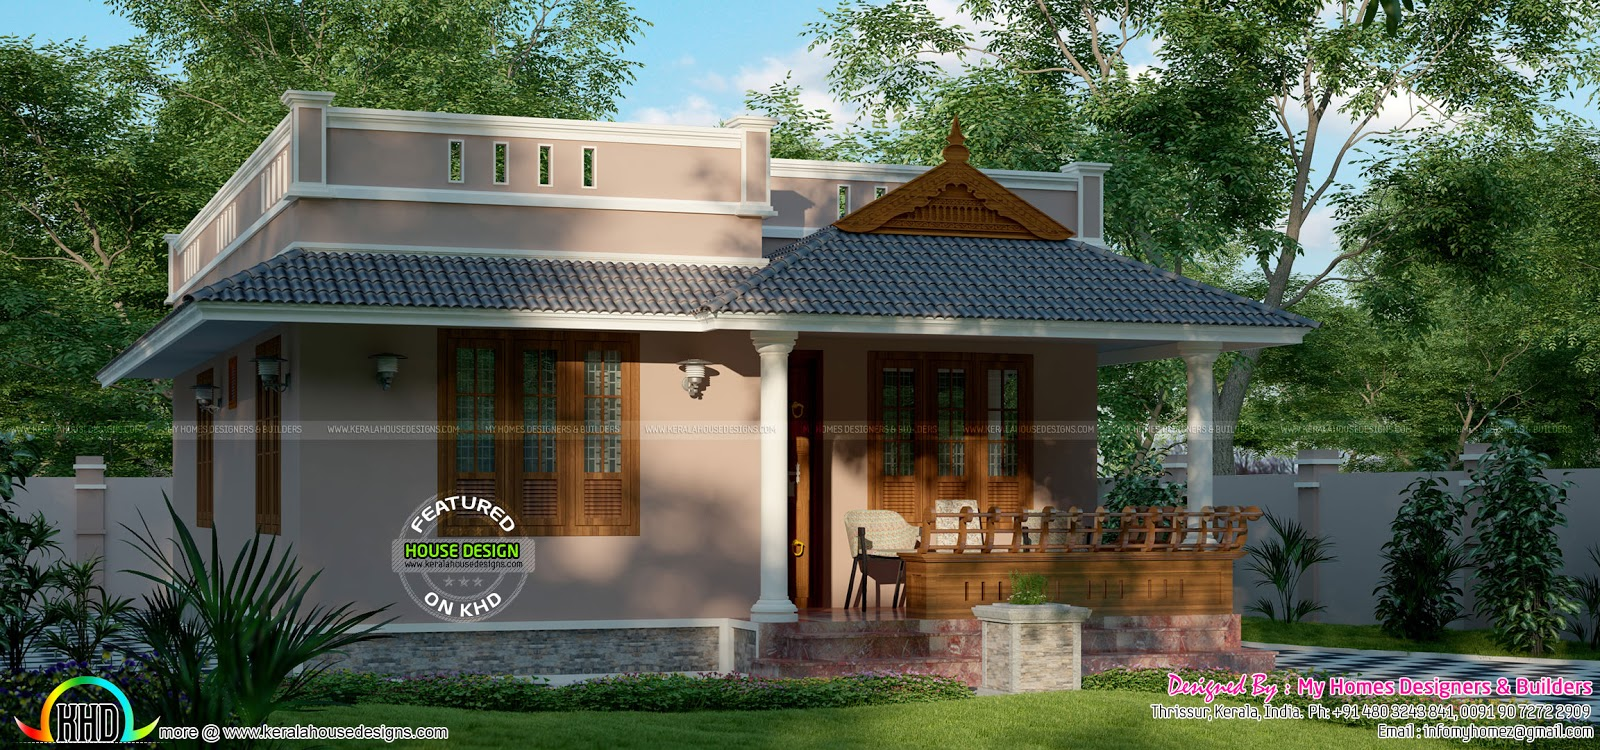 ₹12 lakhs budget Kerala Home design - Kerala home design ...